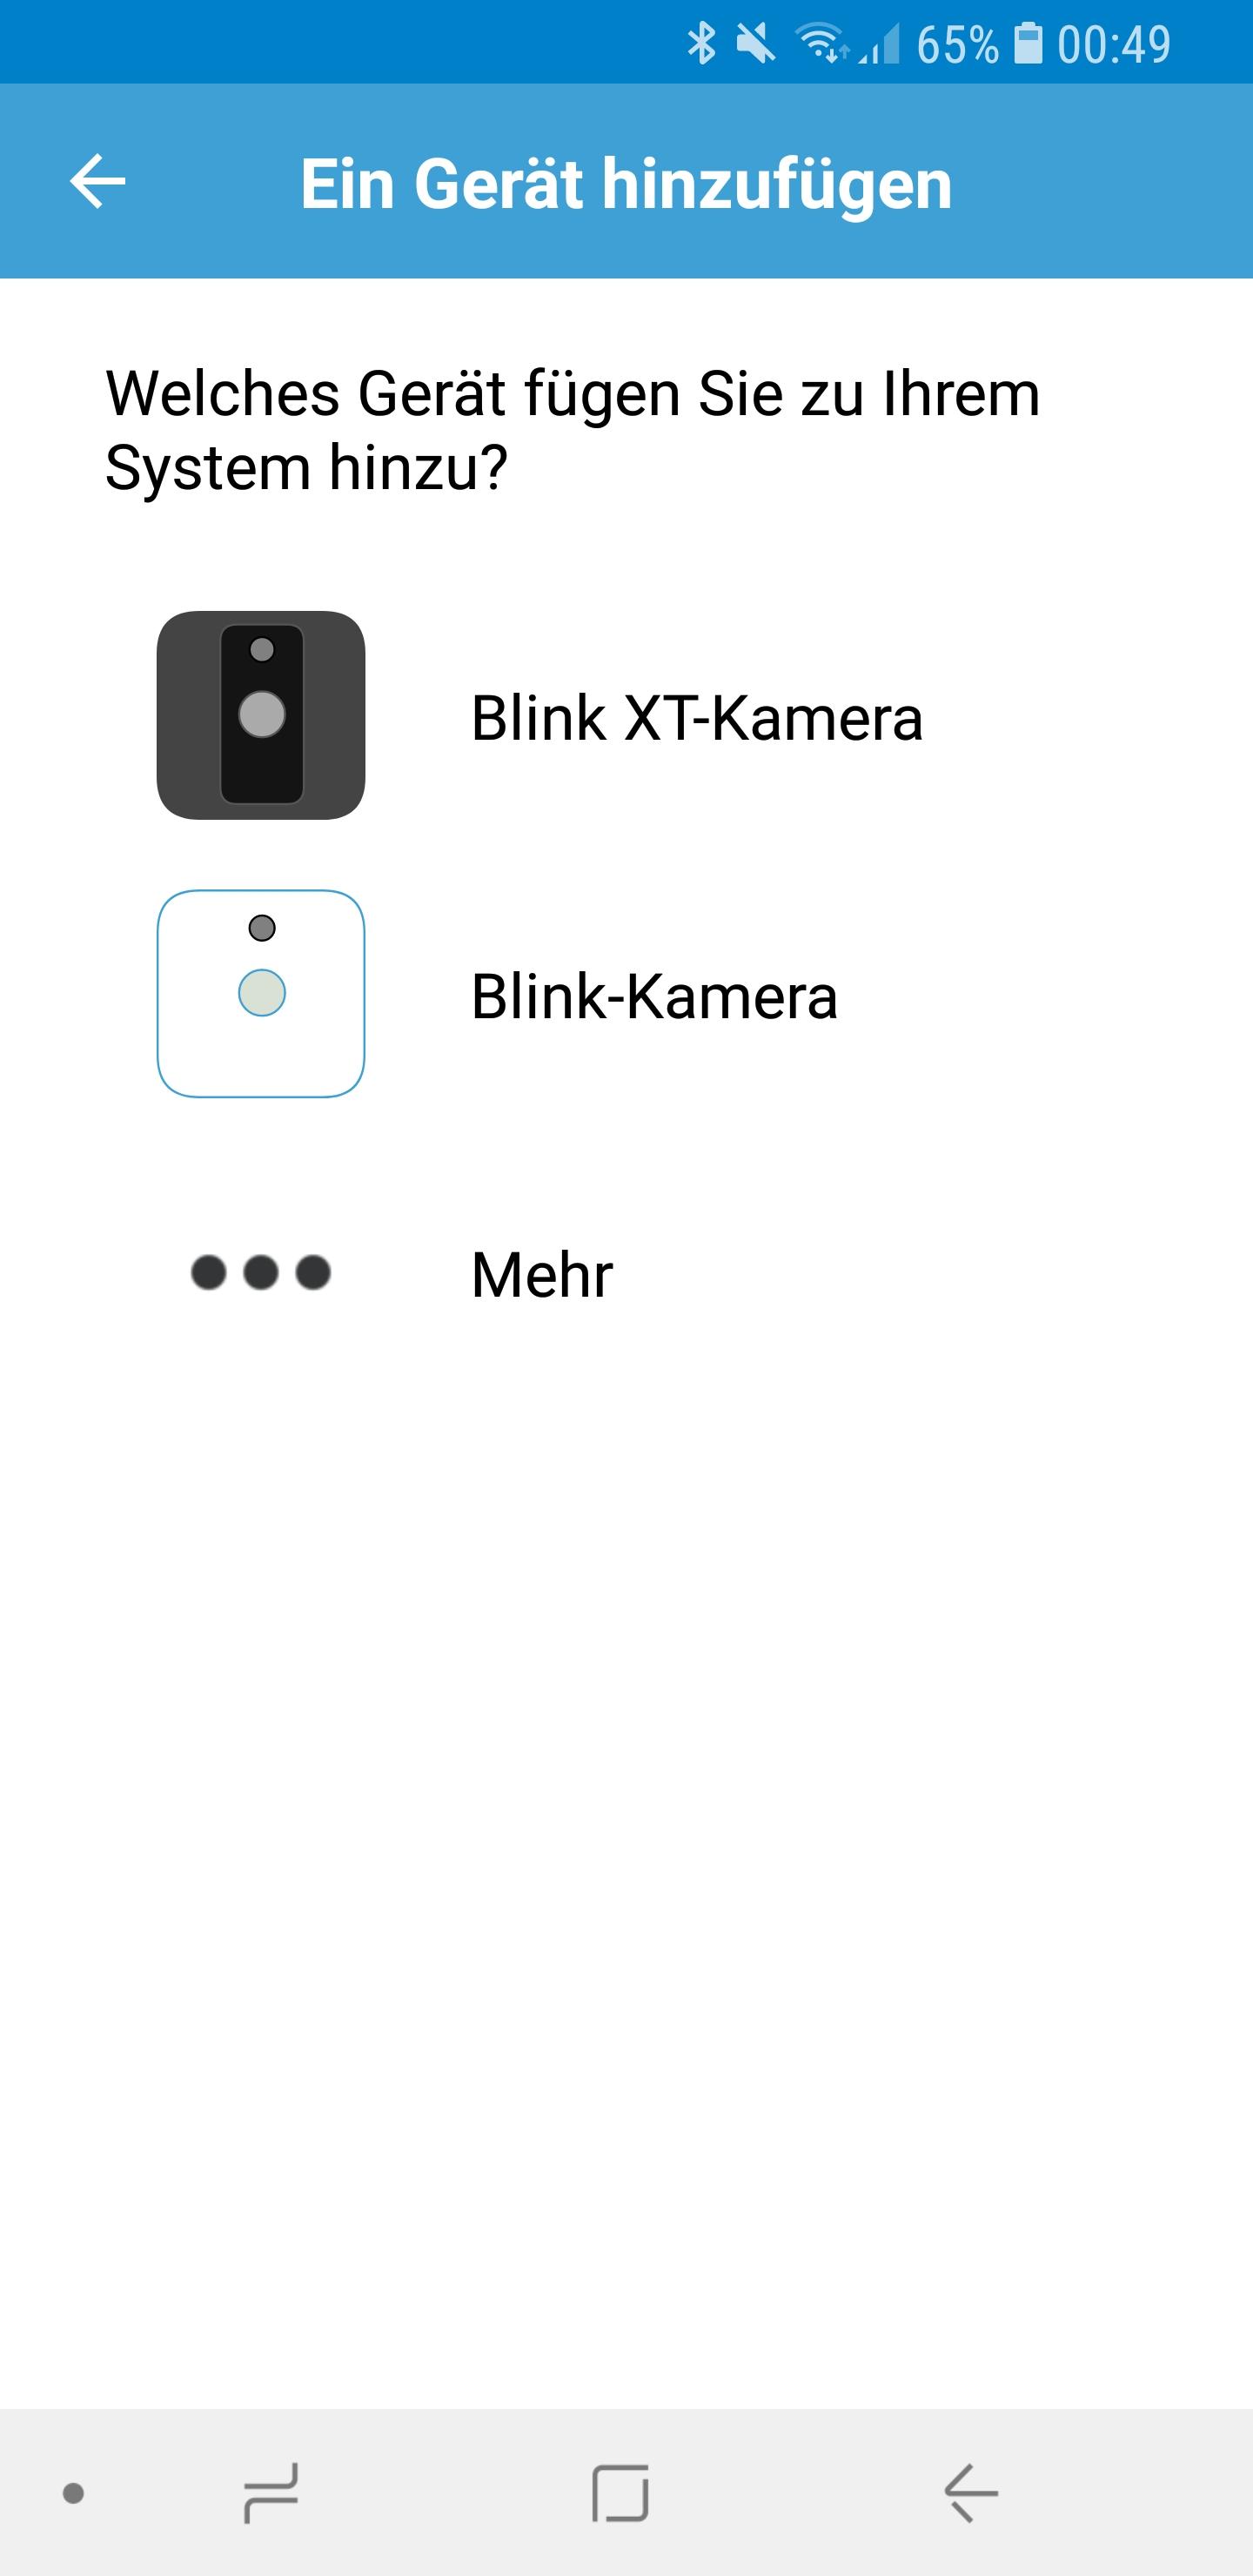 Blink-Classic-hinzufügen-02